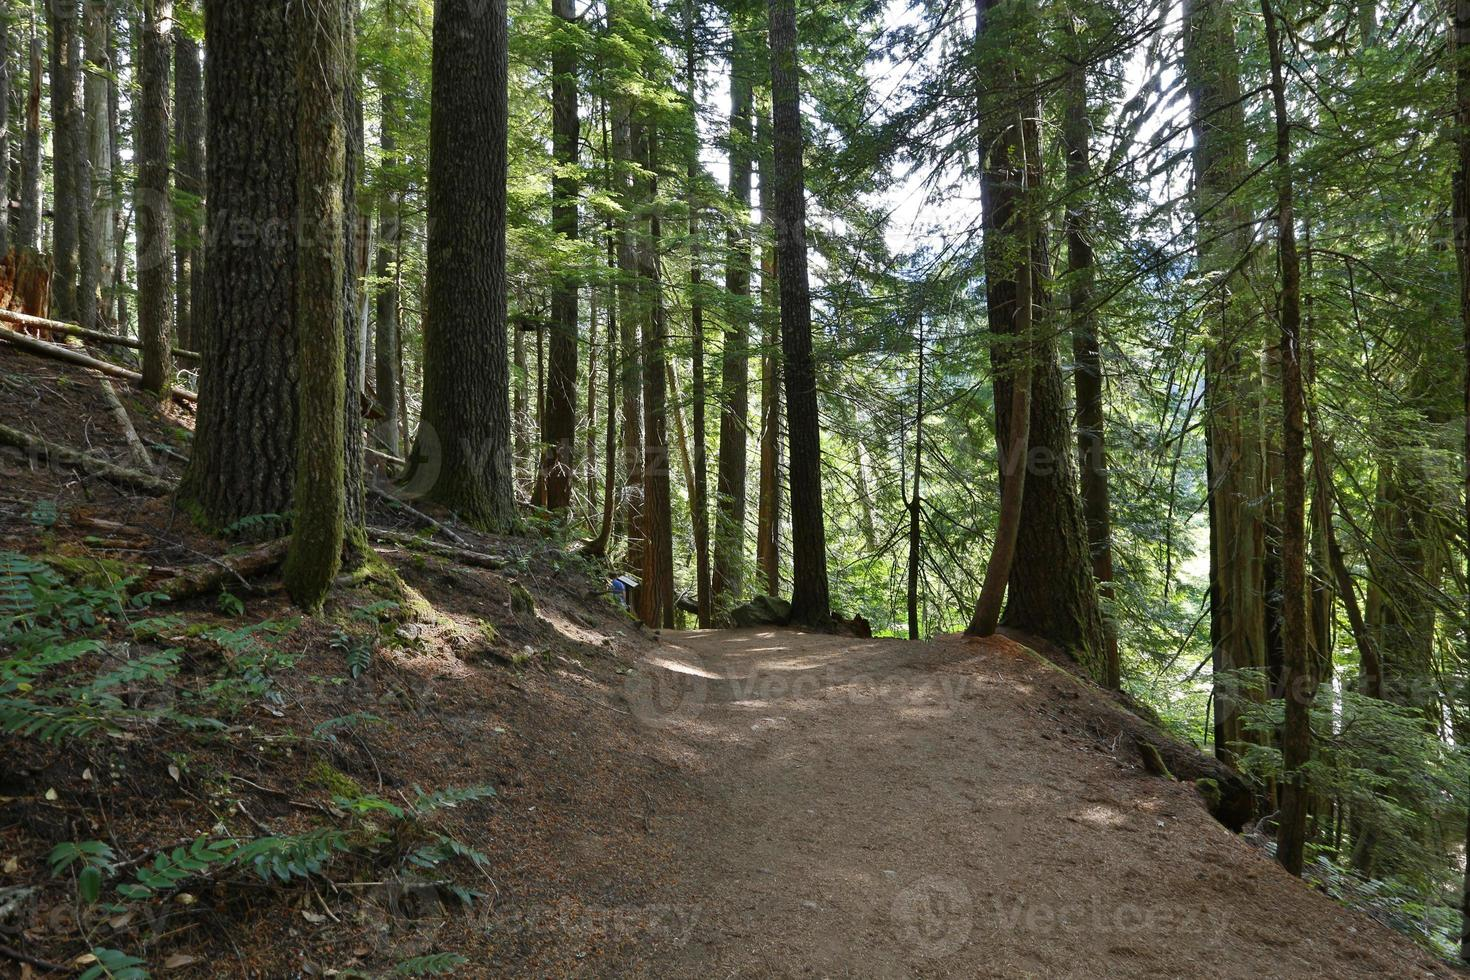 bosque da trilha dos patriarcas foto